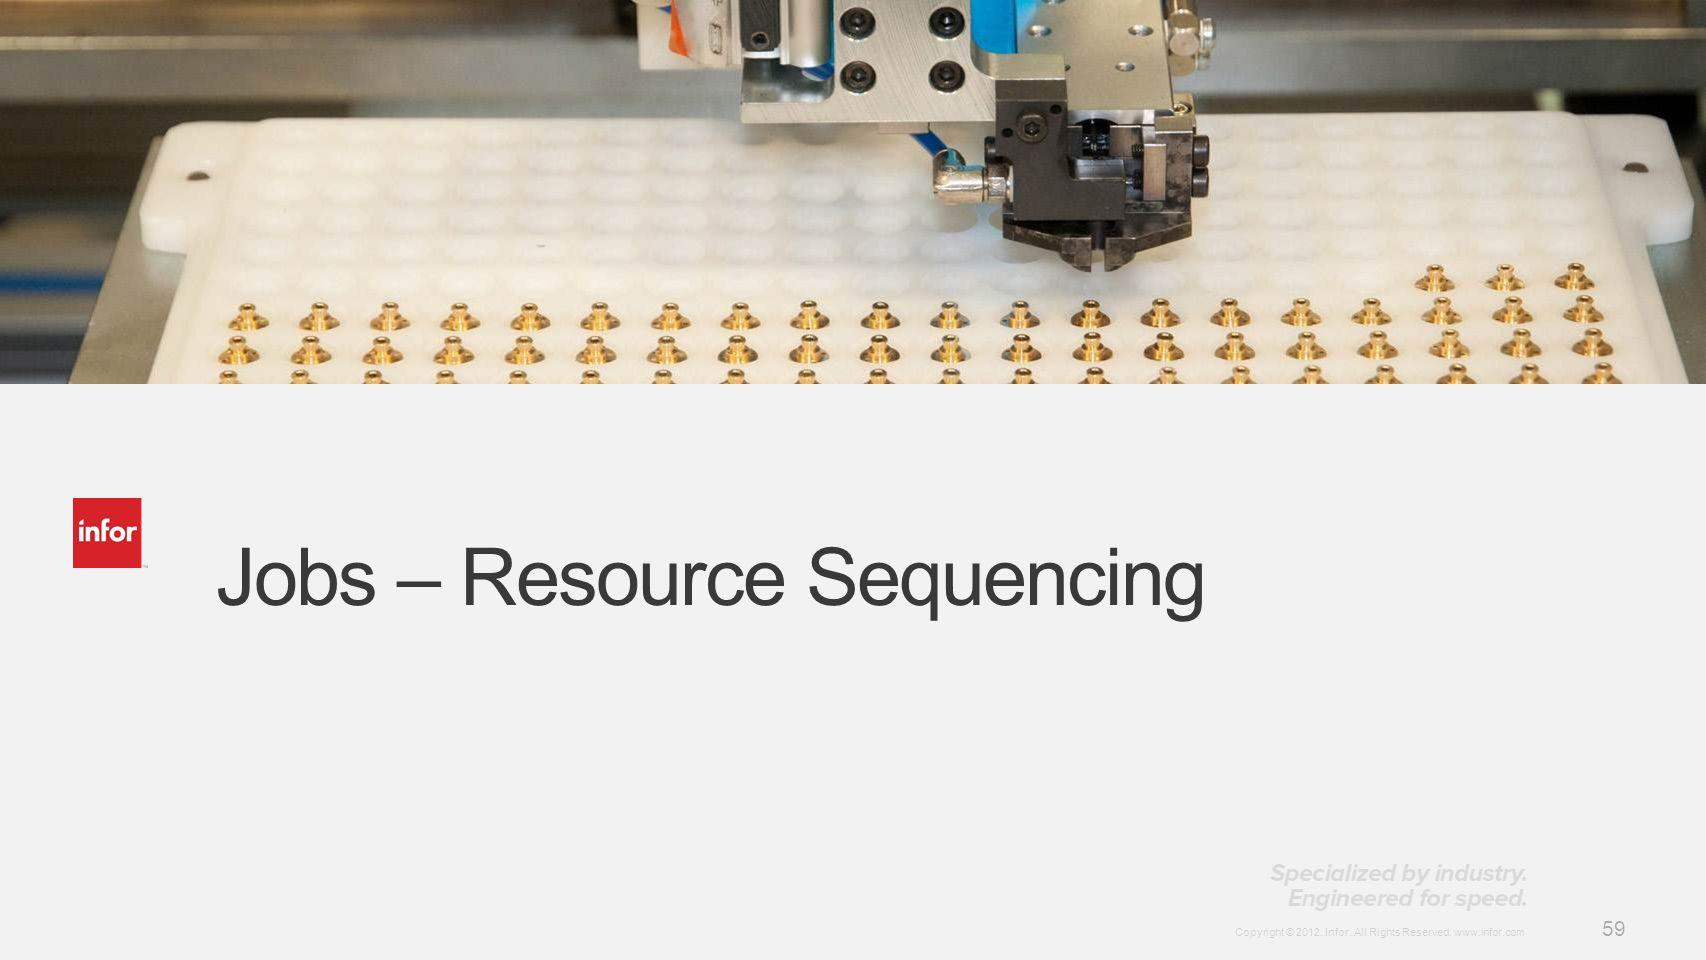 Jobs – Resource Sequencing